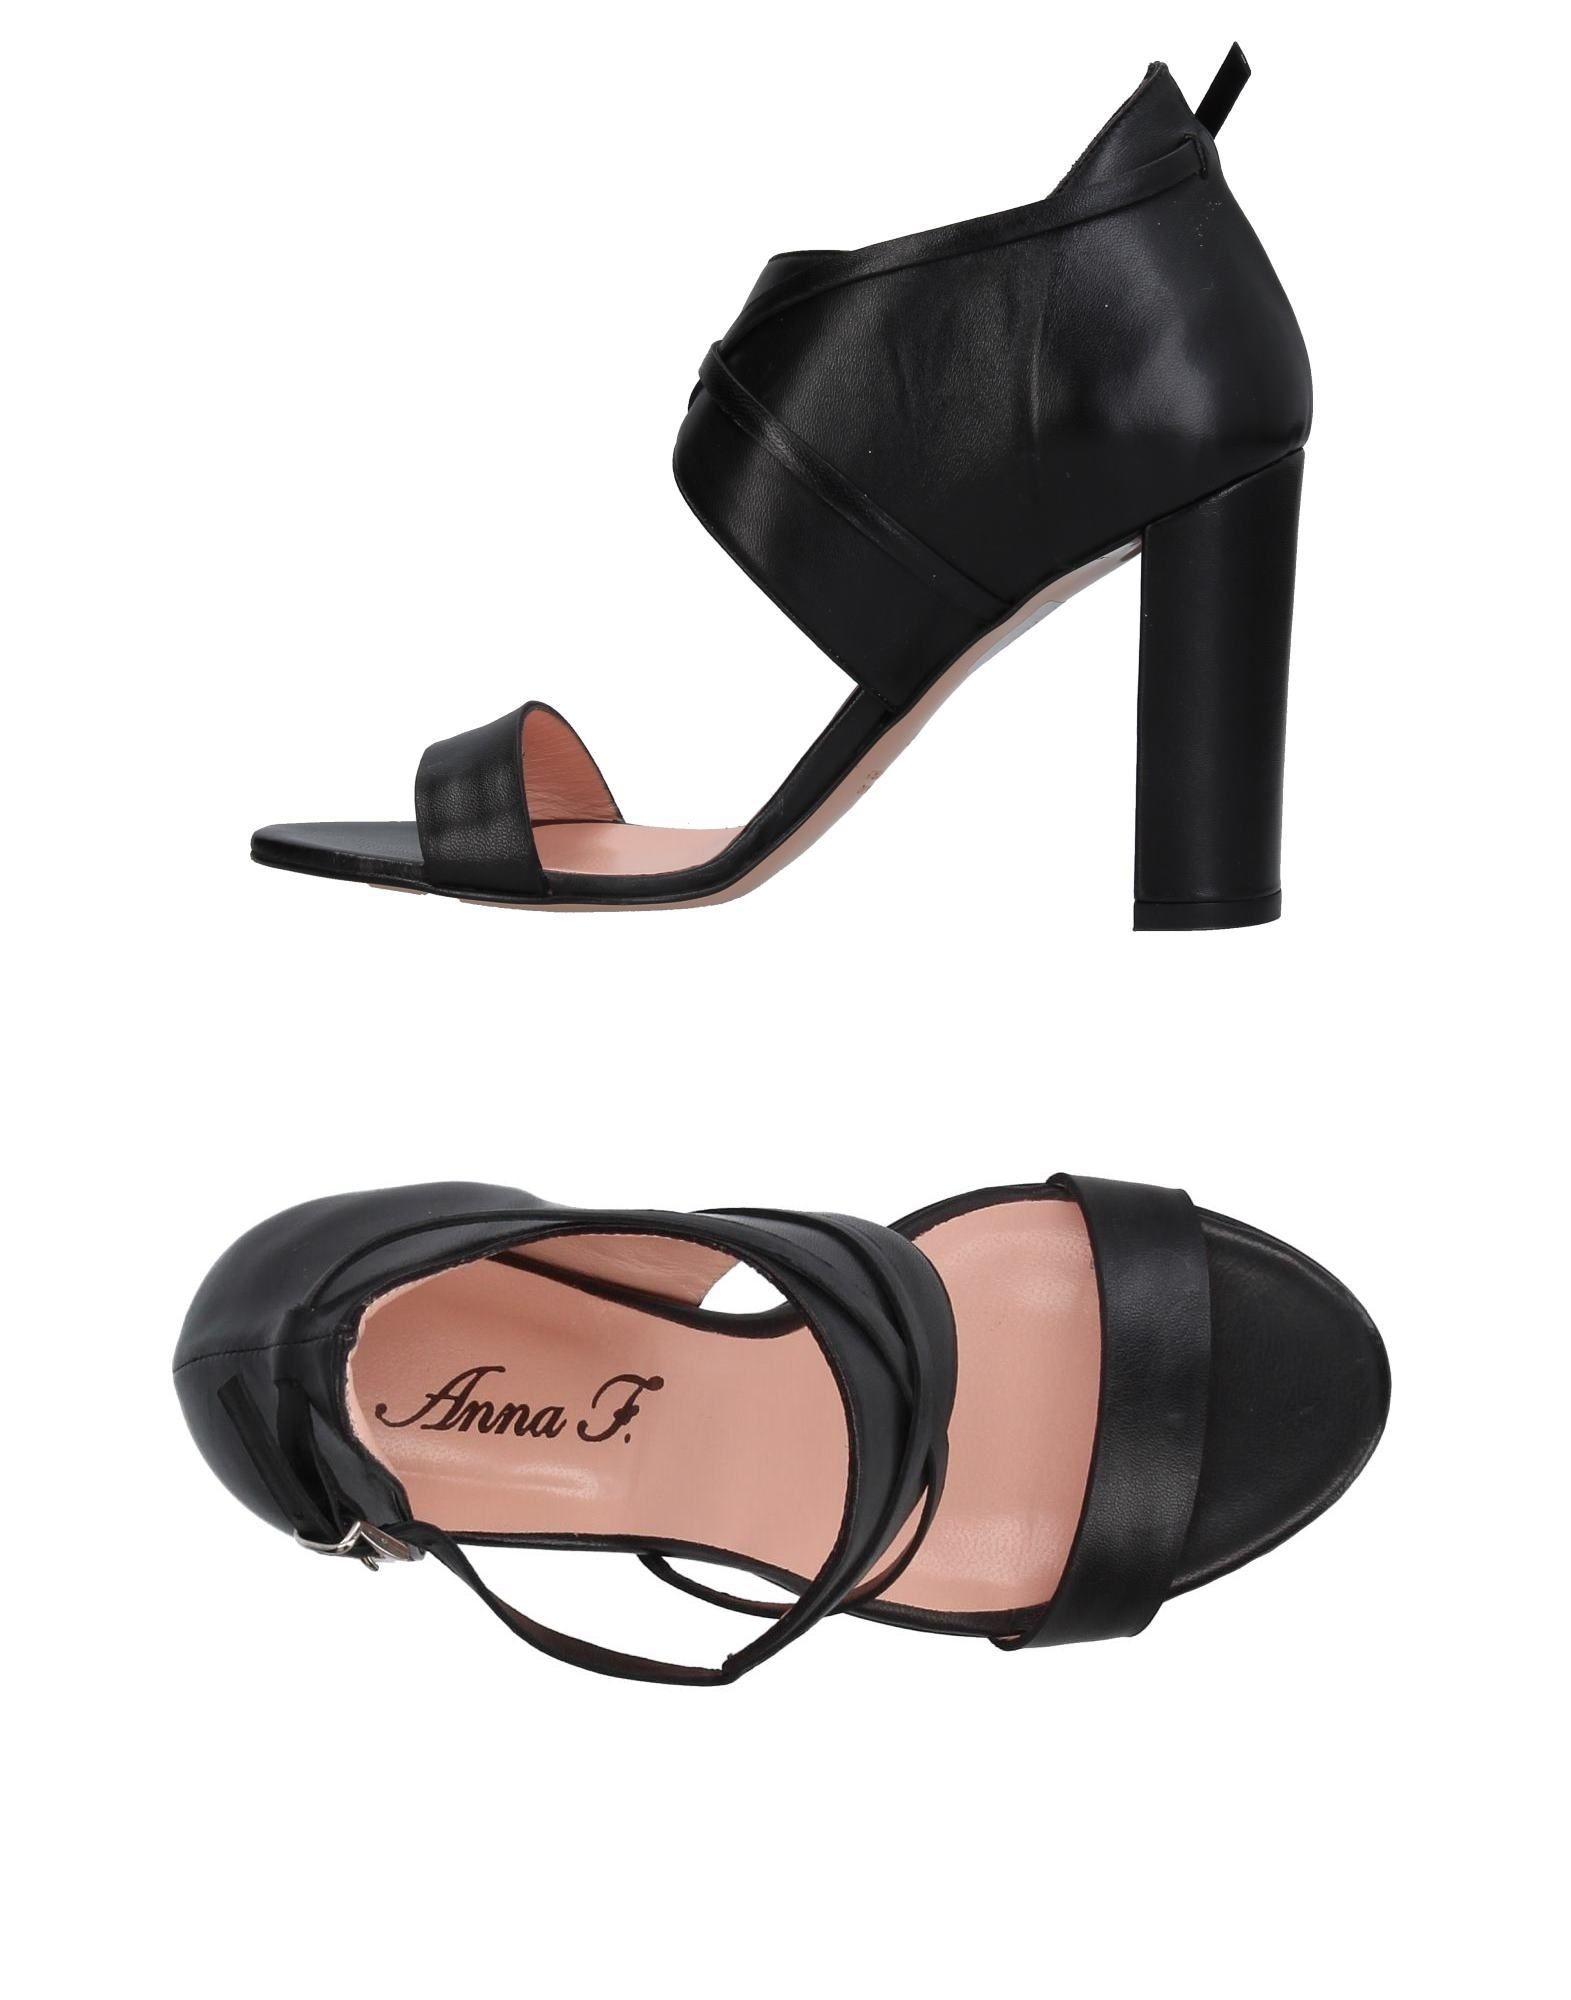 Anna F. Sandalen Damen  11381147HP Gute Qualität beliebte Schuhe